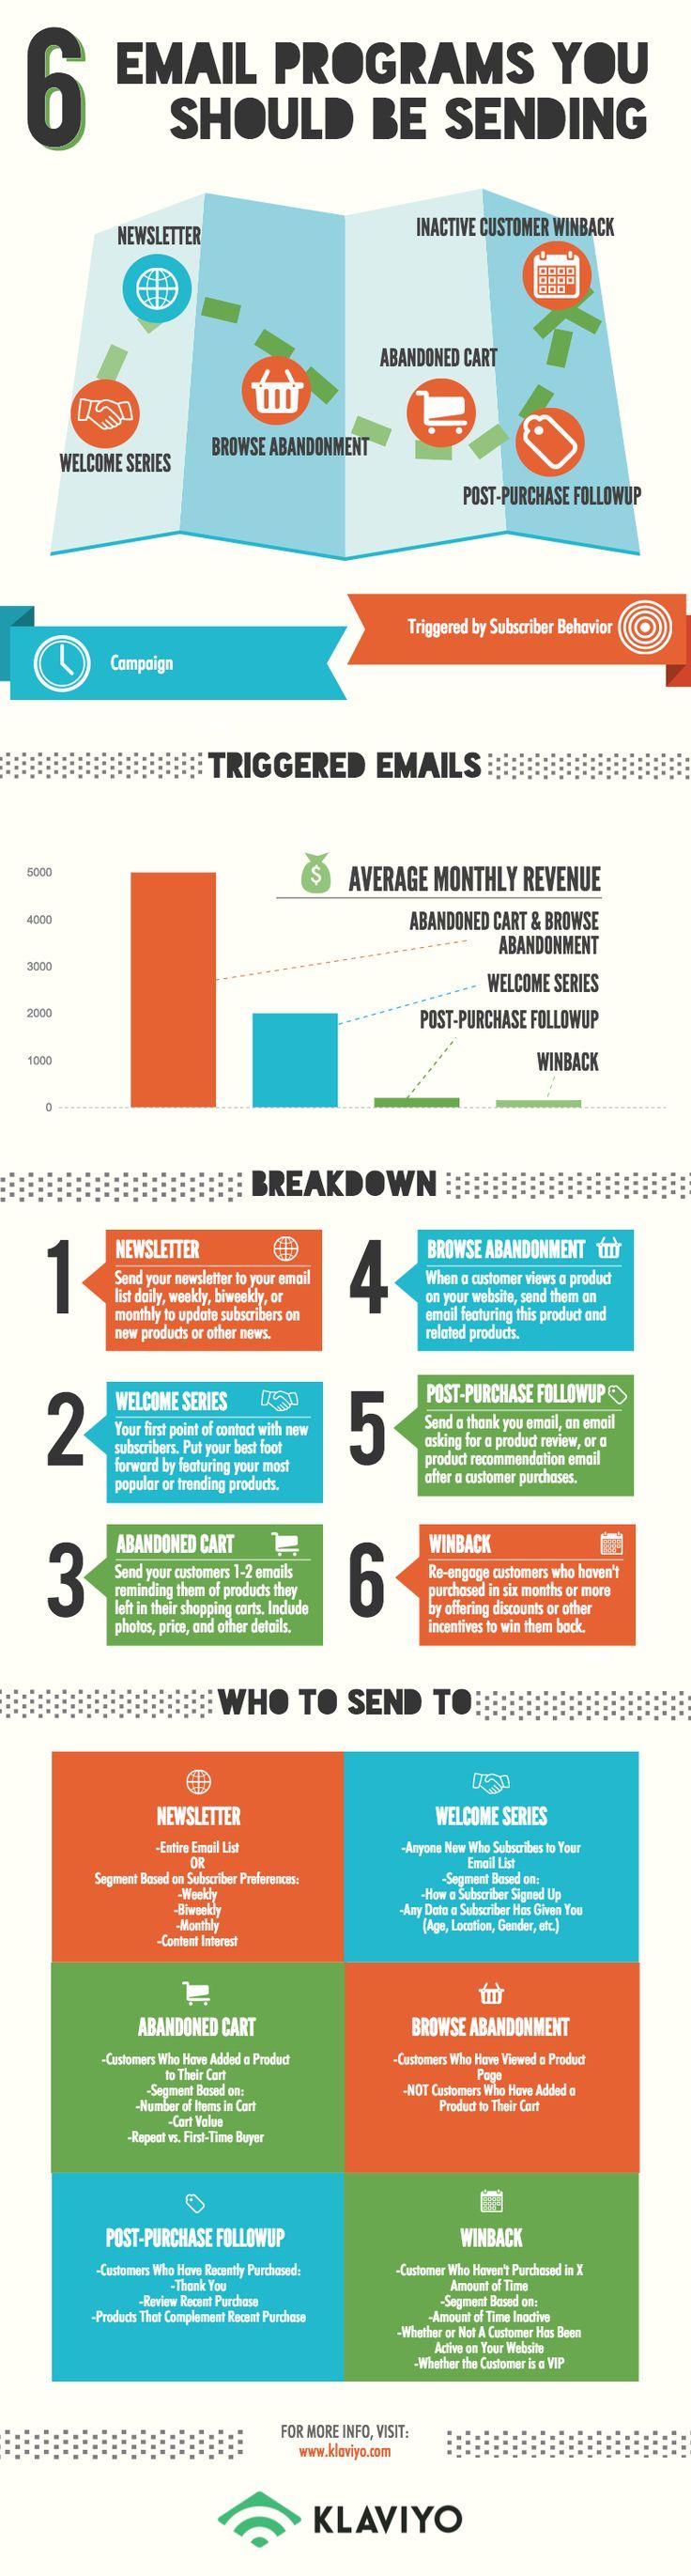 6 Email Programs You Should Be Sending (Infographic) – Klaviyo Blog